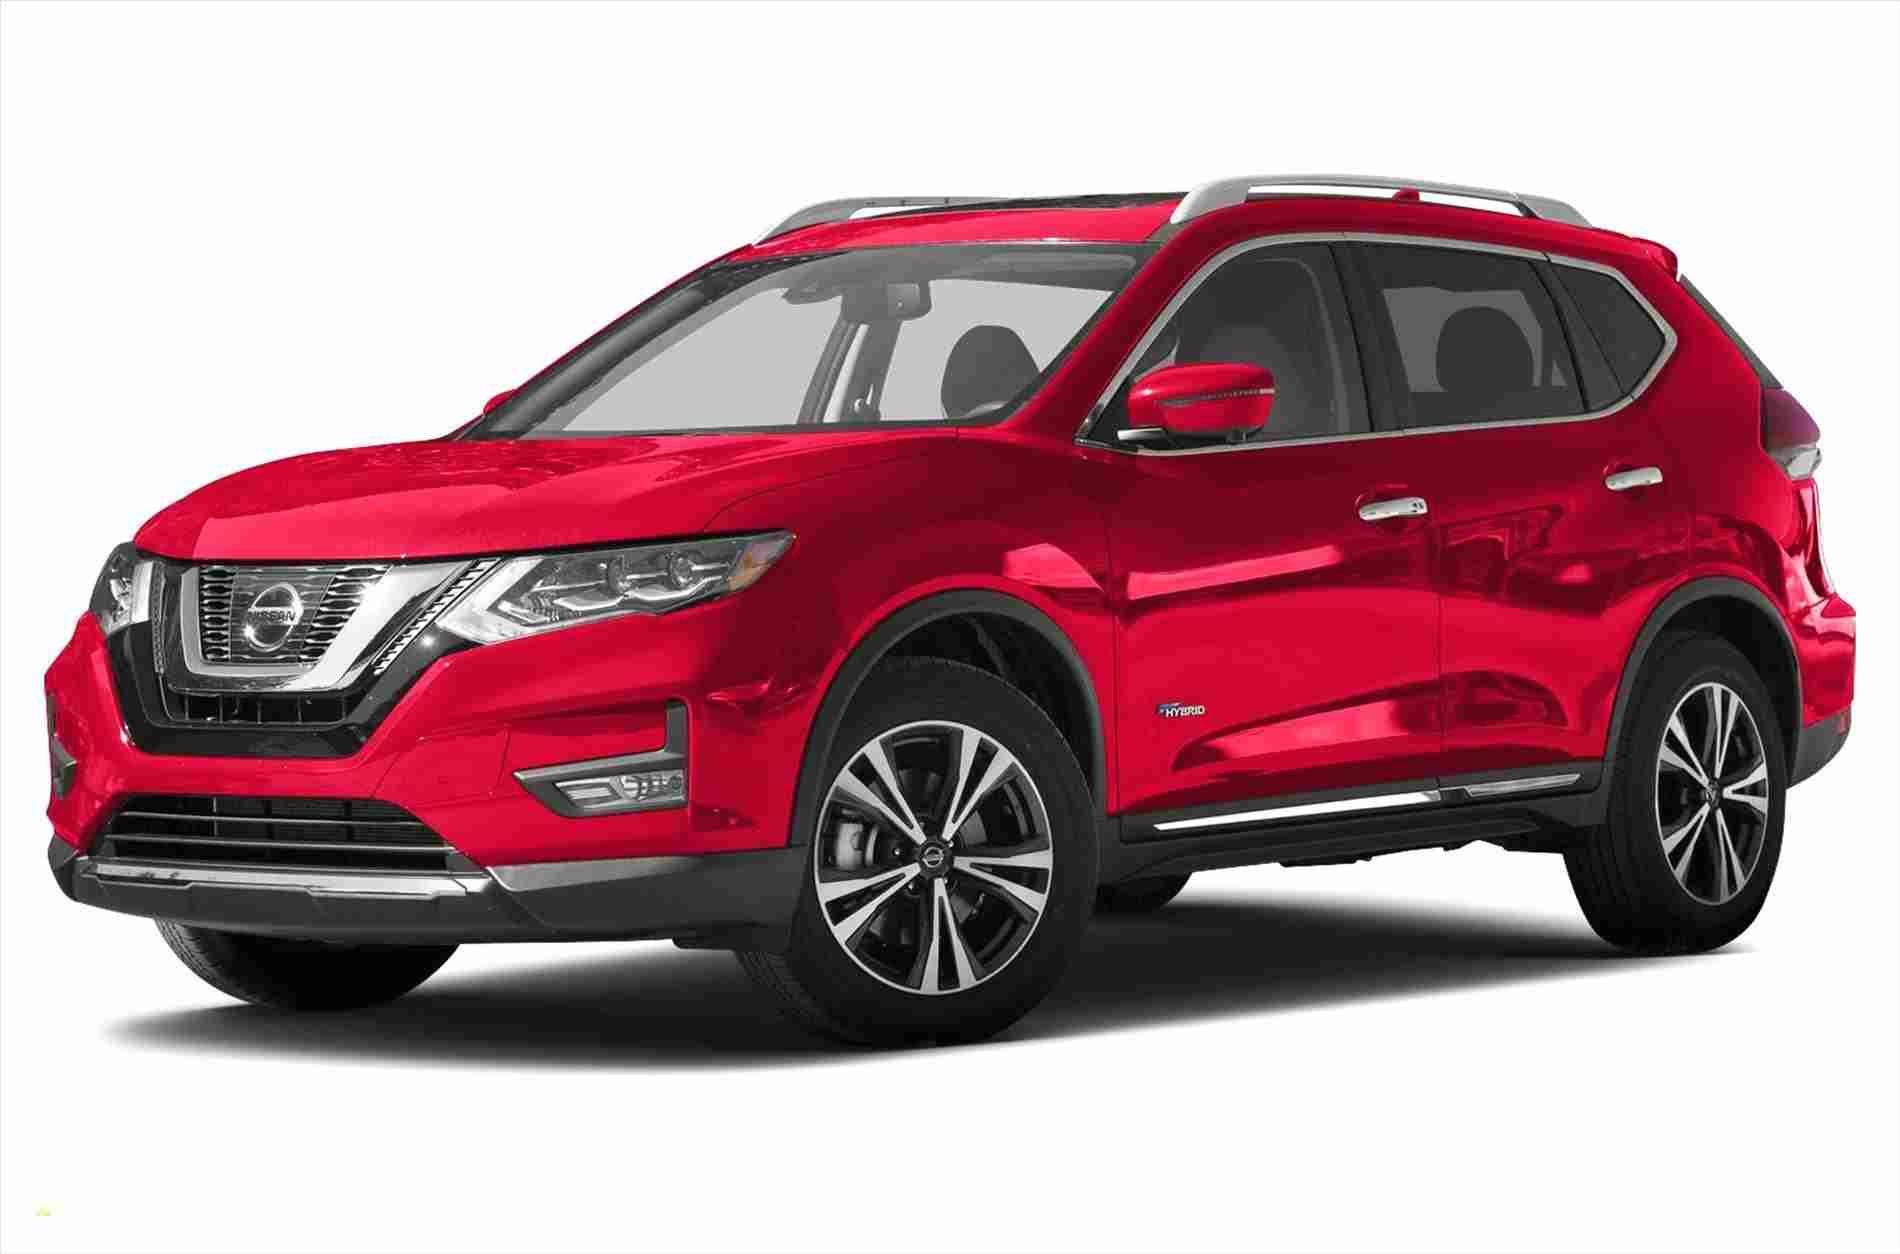 Nissan Rogue Red 2017 Nissan rogue, Nissan, Nissan rogue s